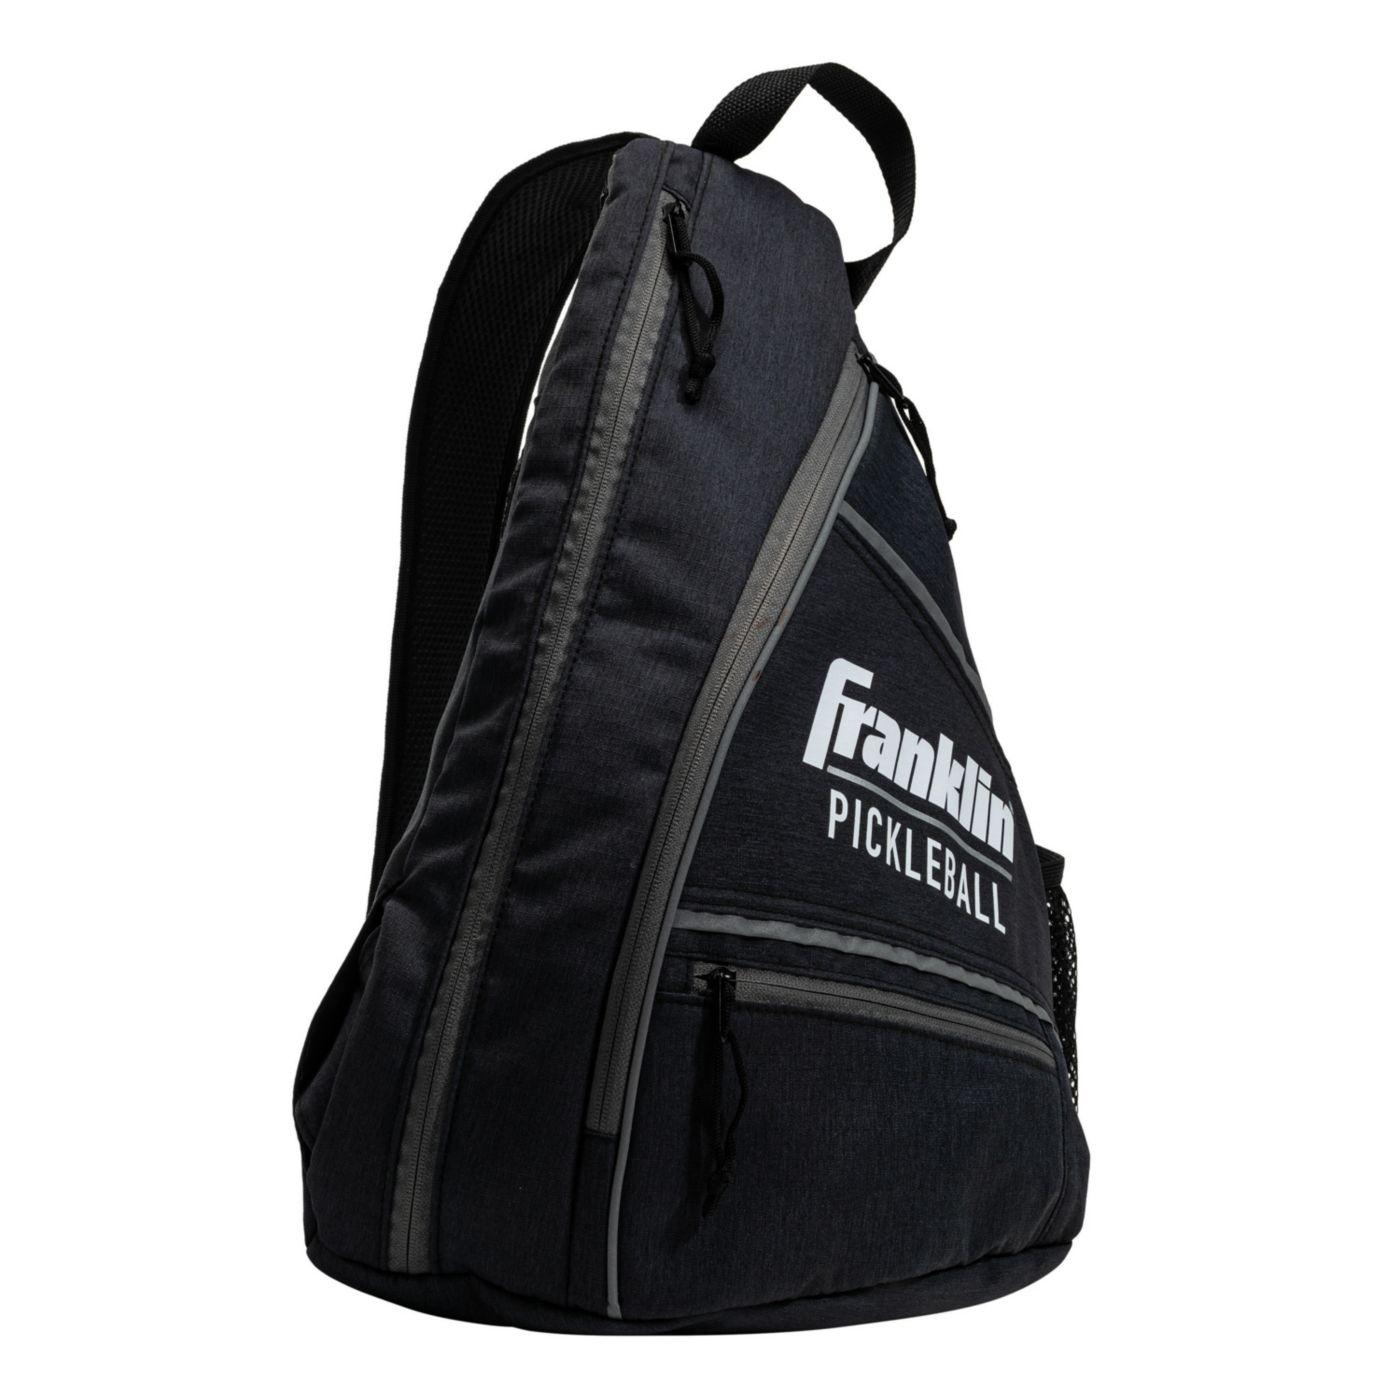 Franklin Pickleball Bag